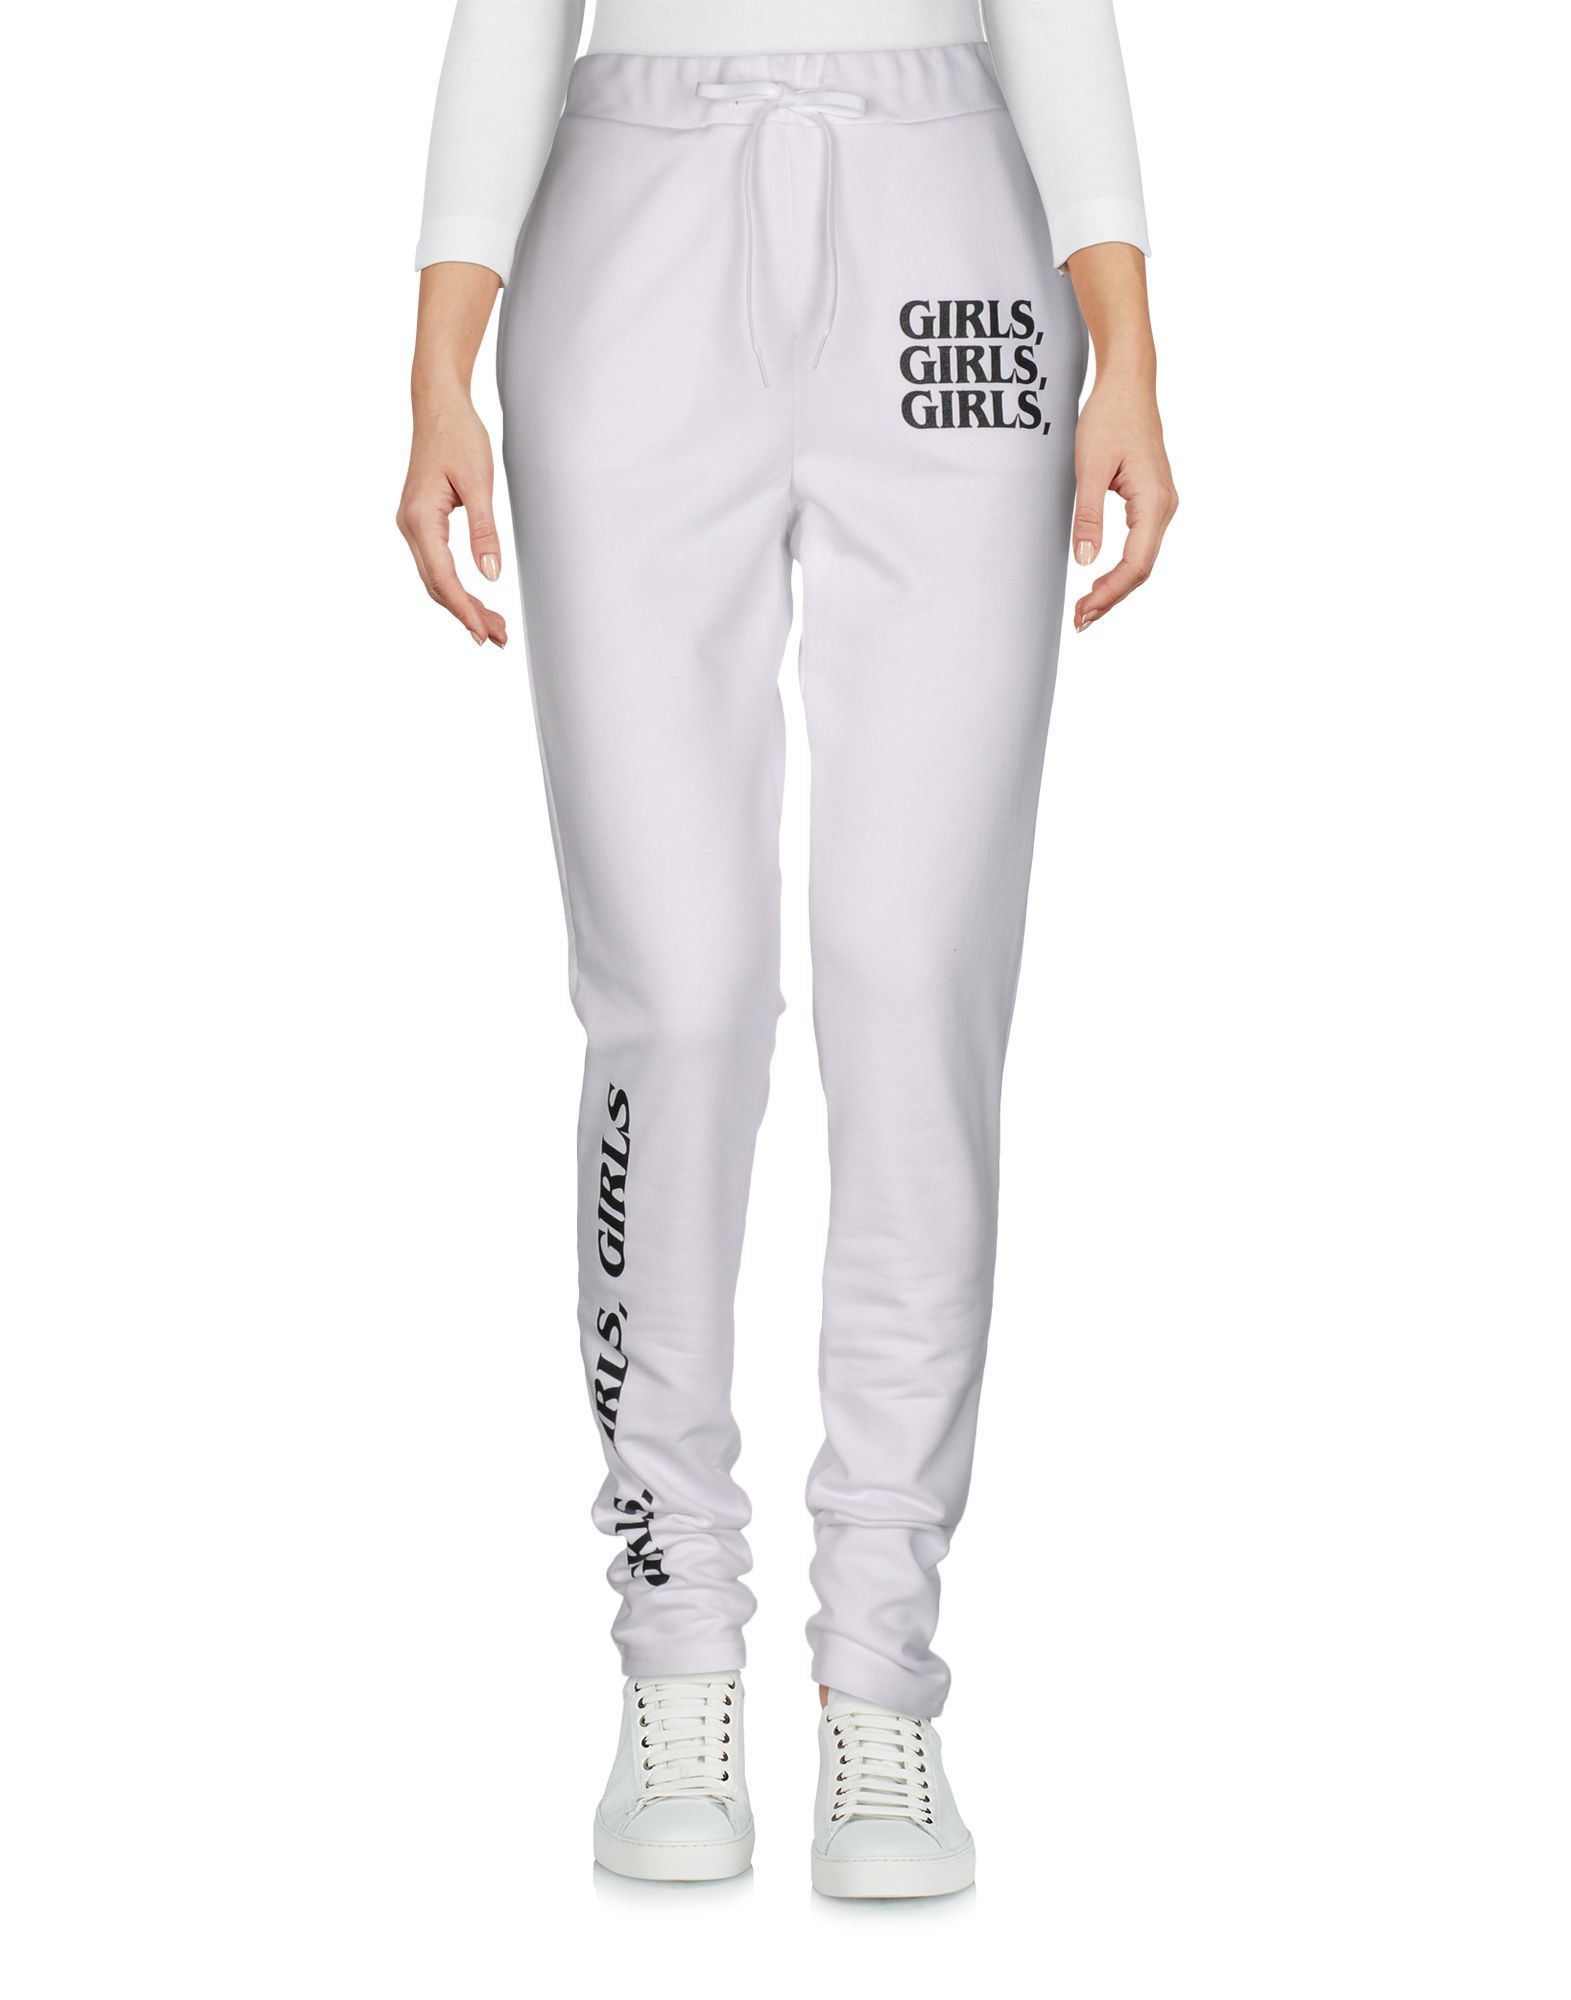 BRASHY Casual Pants in White